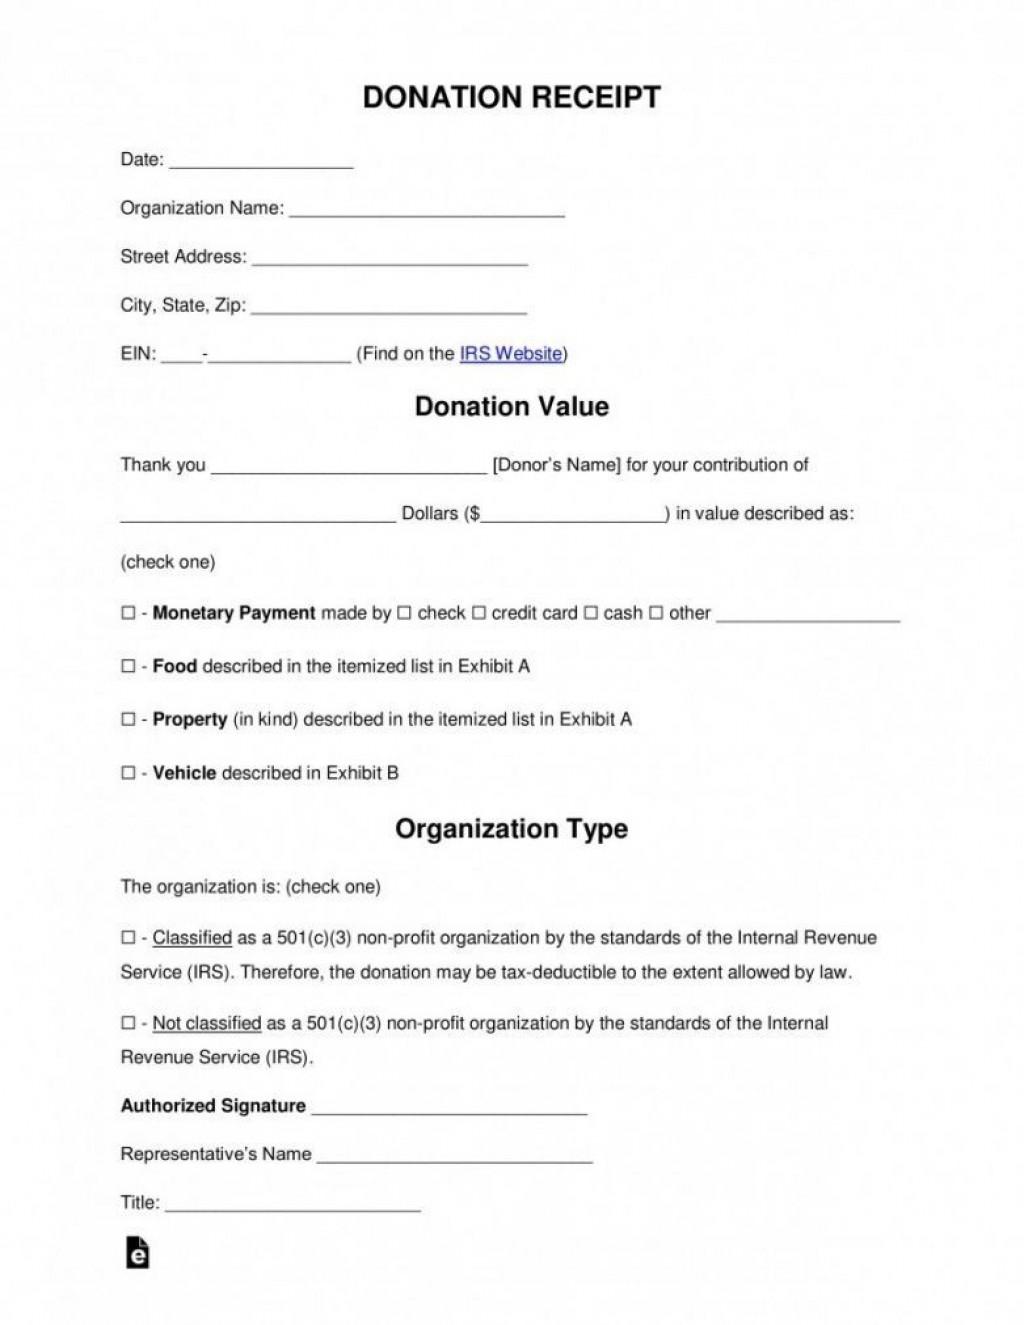 003 Magnificent Tax Deductible Donation Receipt Printable Idea Large